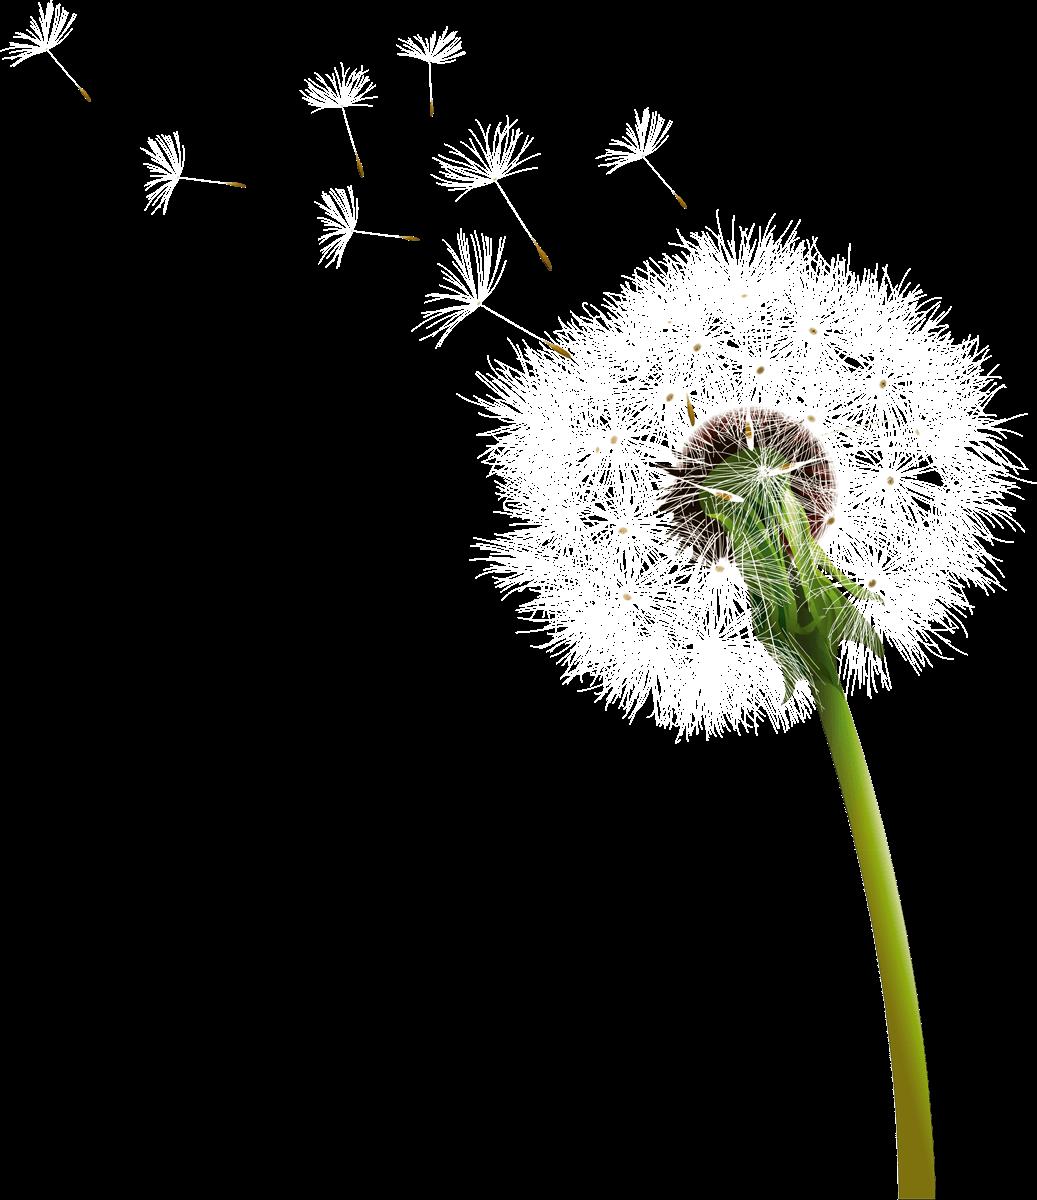 Dandelion flower clipart jpg free stock Dandelion Blowing transparent PNG - StickPNG jpg free stock